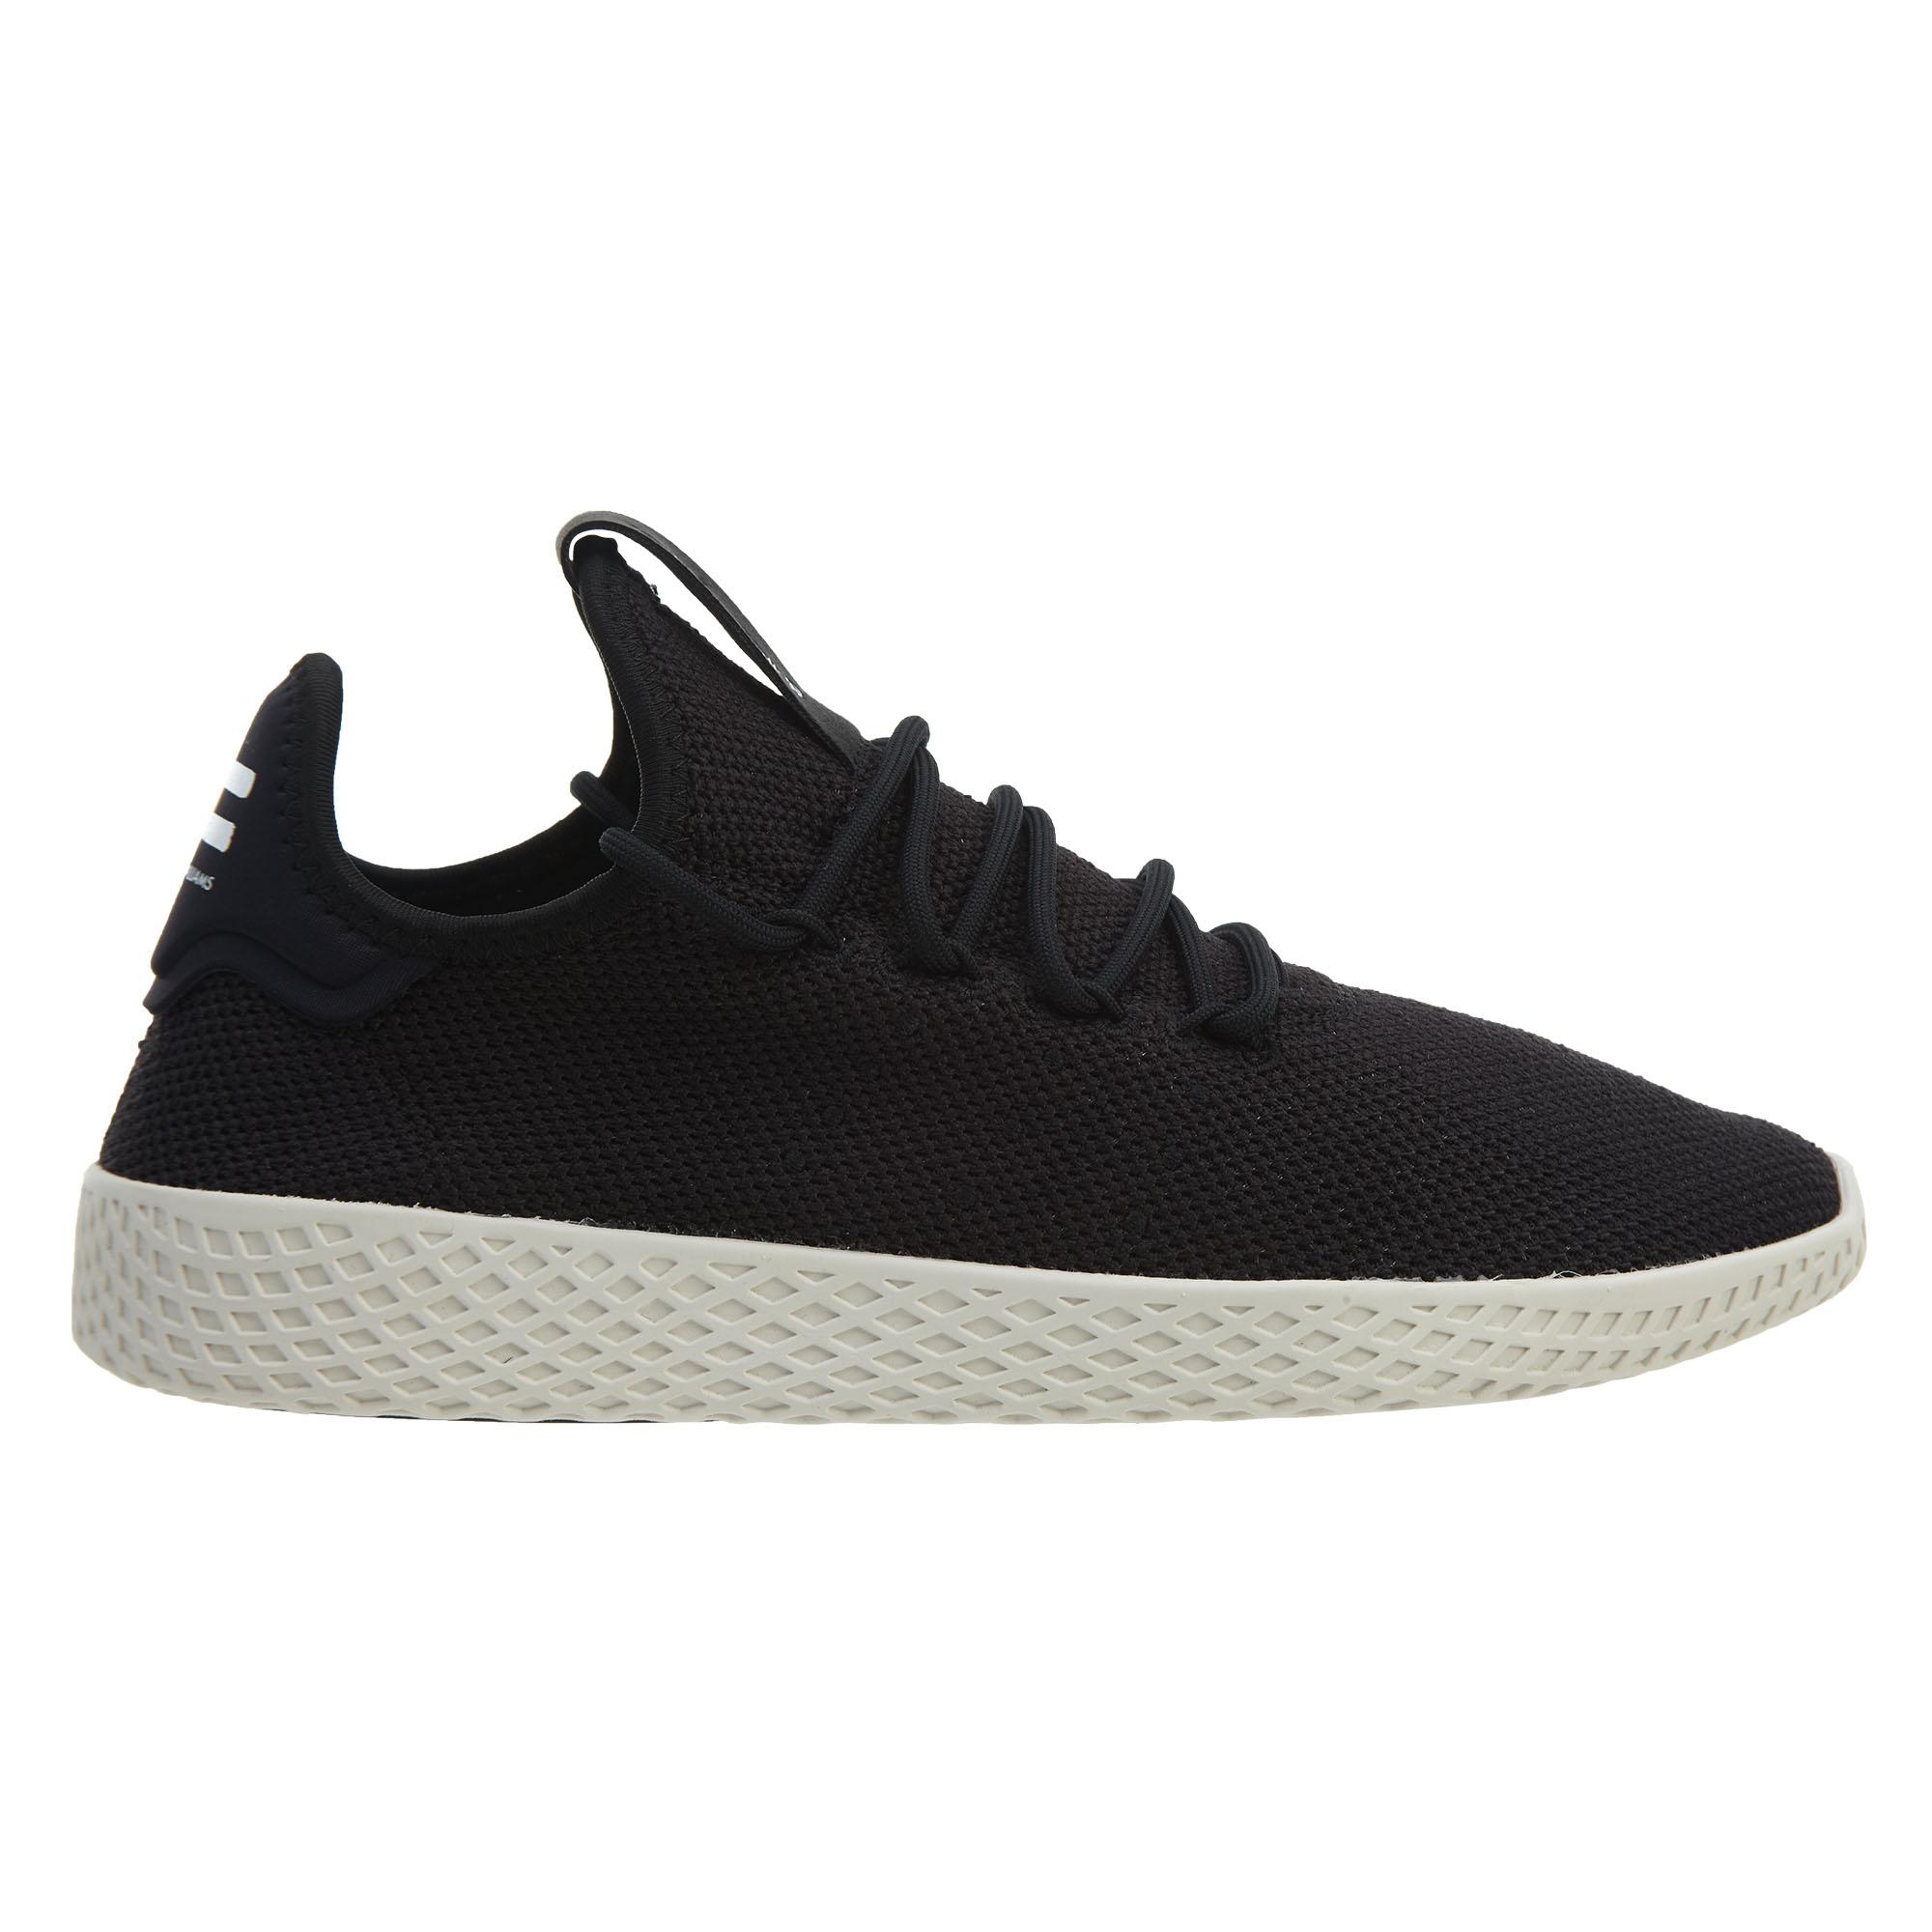 8f4d4889 HypeAnalyzer · adidas Pw Tennis Hu Black Black-White